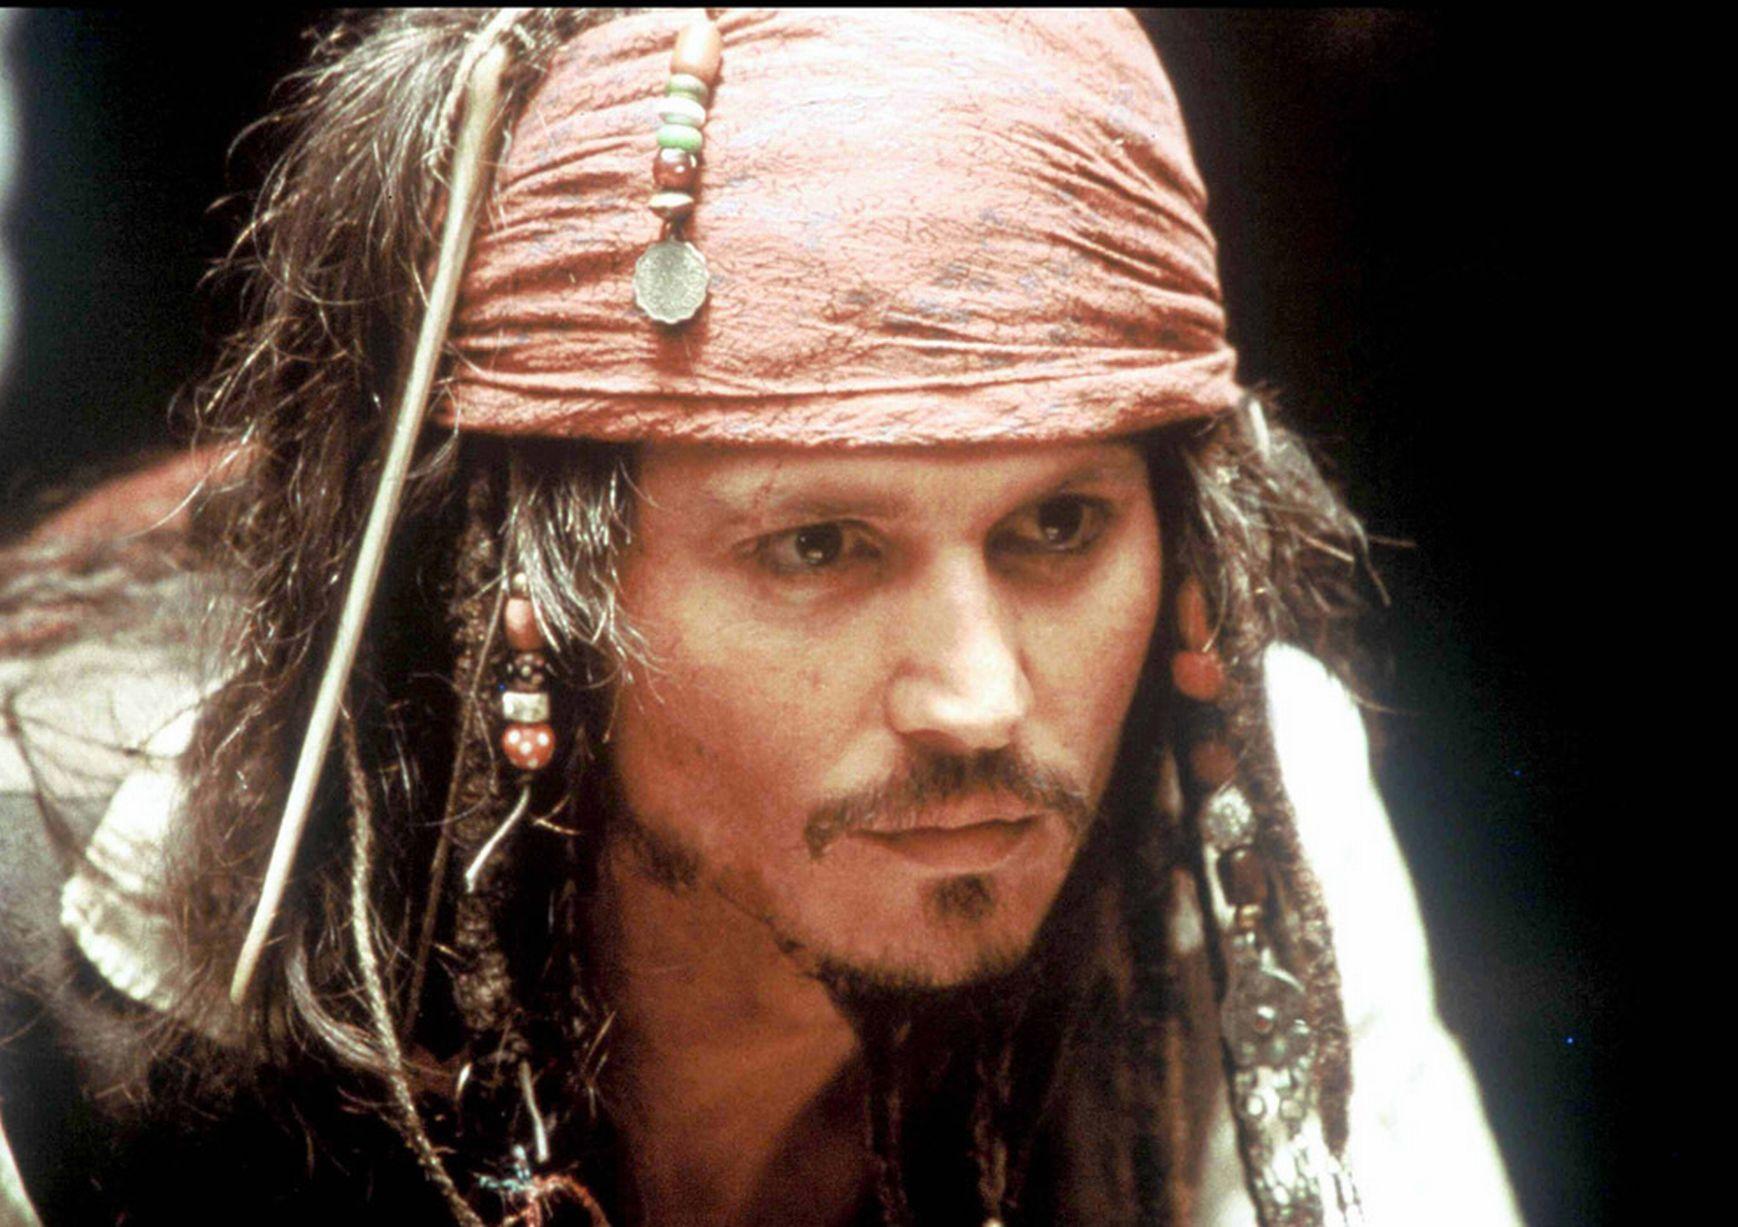 Johnny-Depp-as-Jack-Sparrow